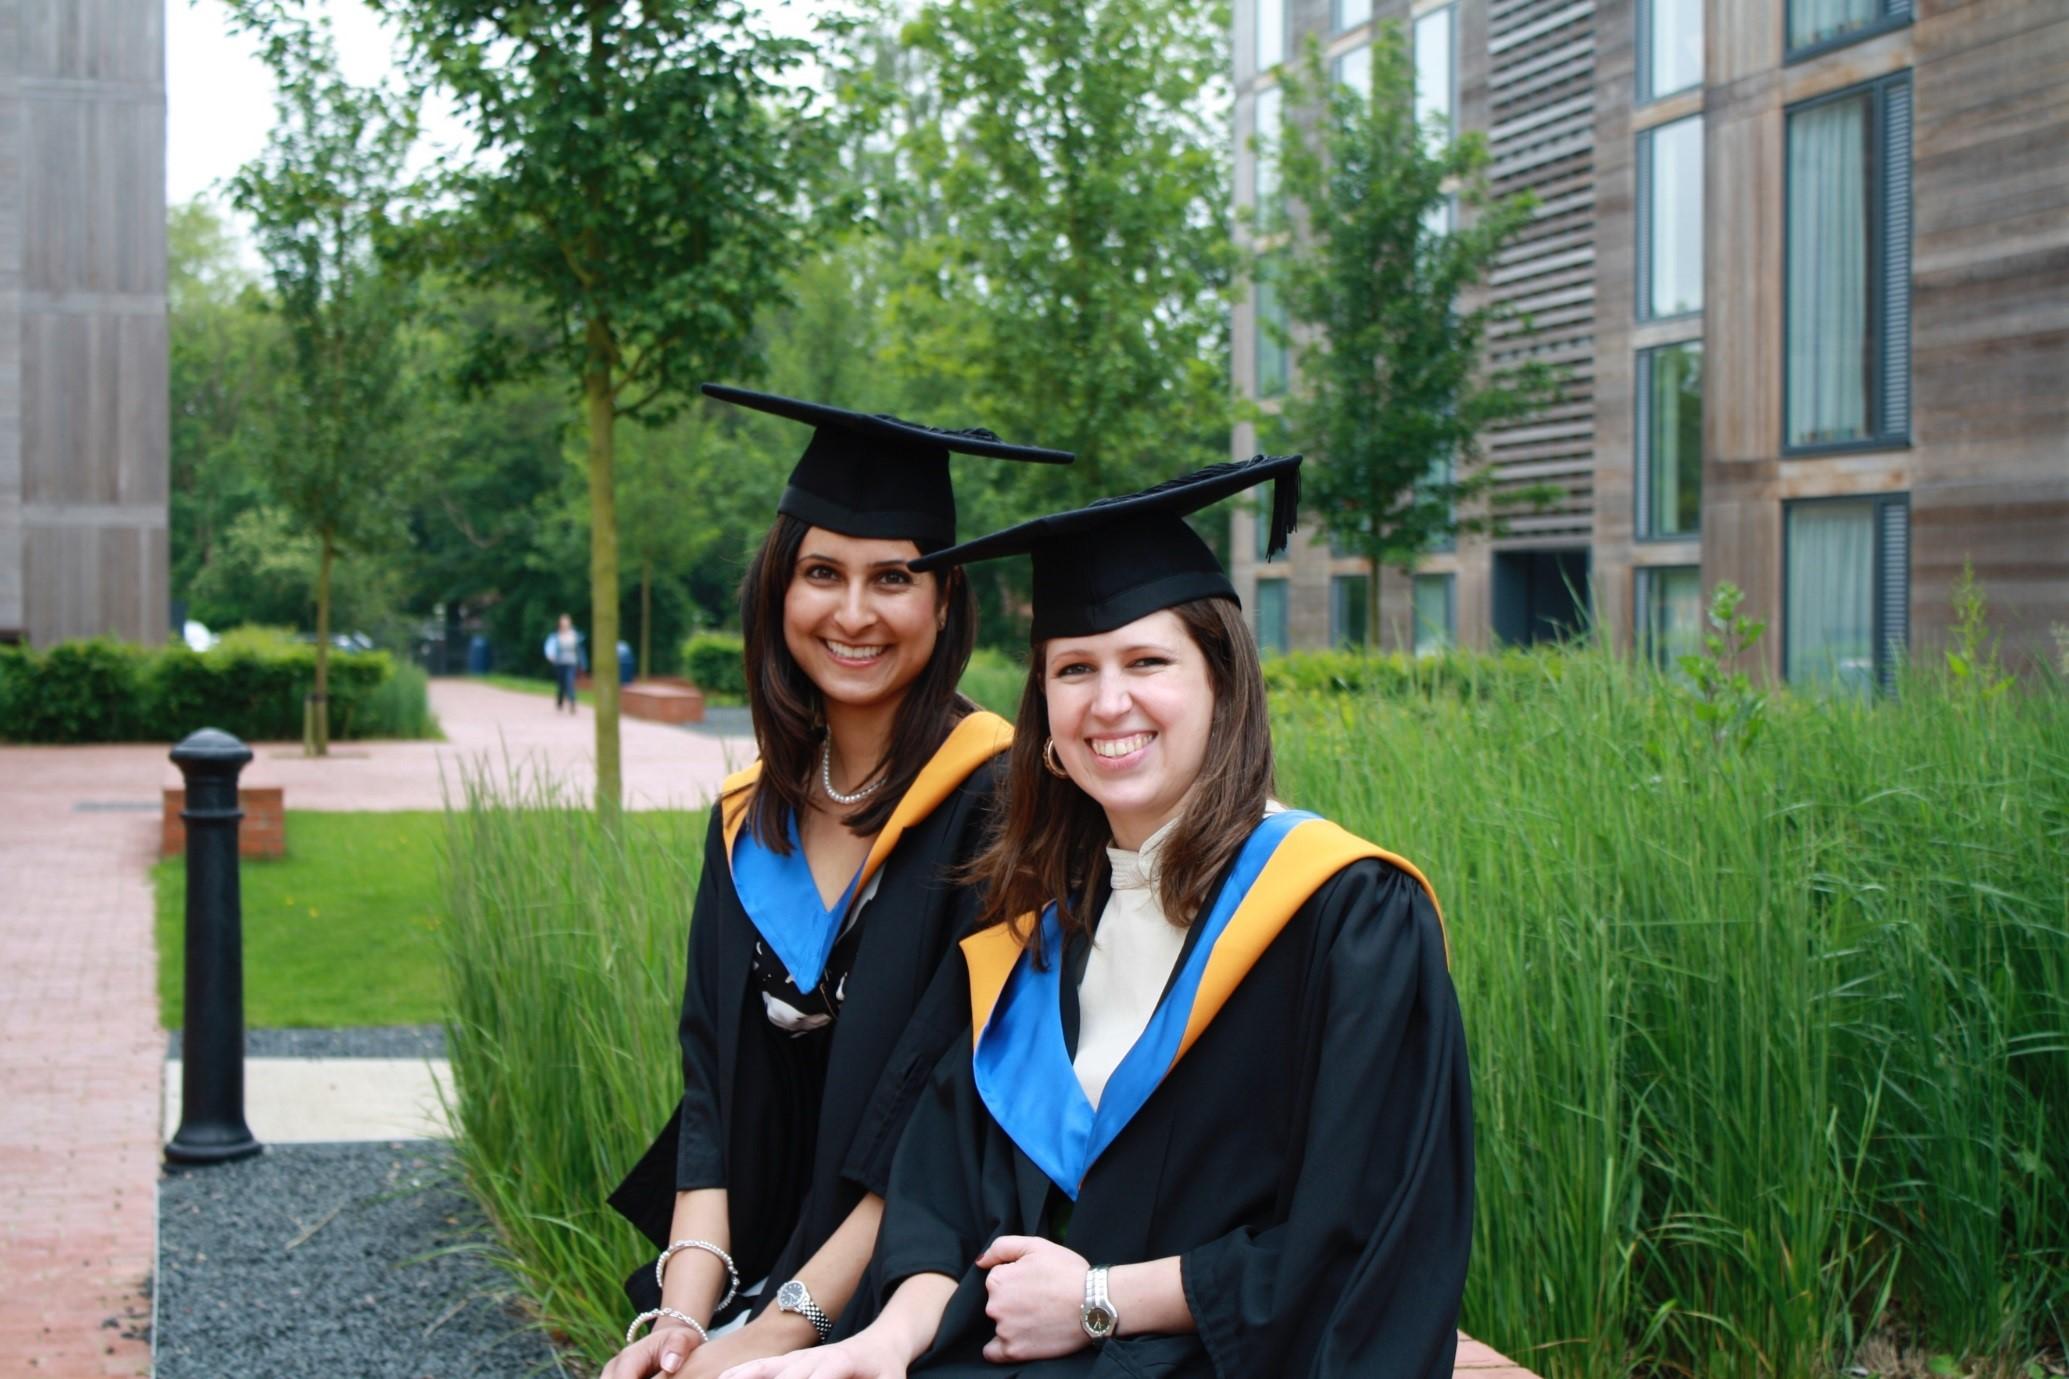 Figure 1 MSc Graduation Day with my best friend